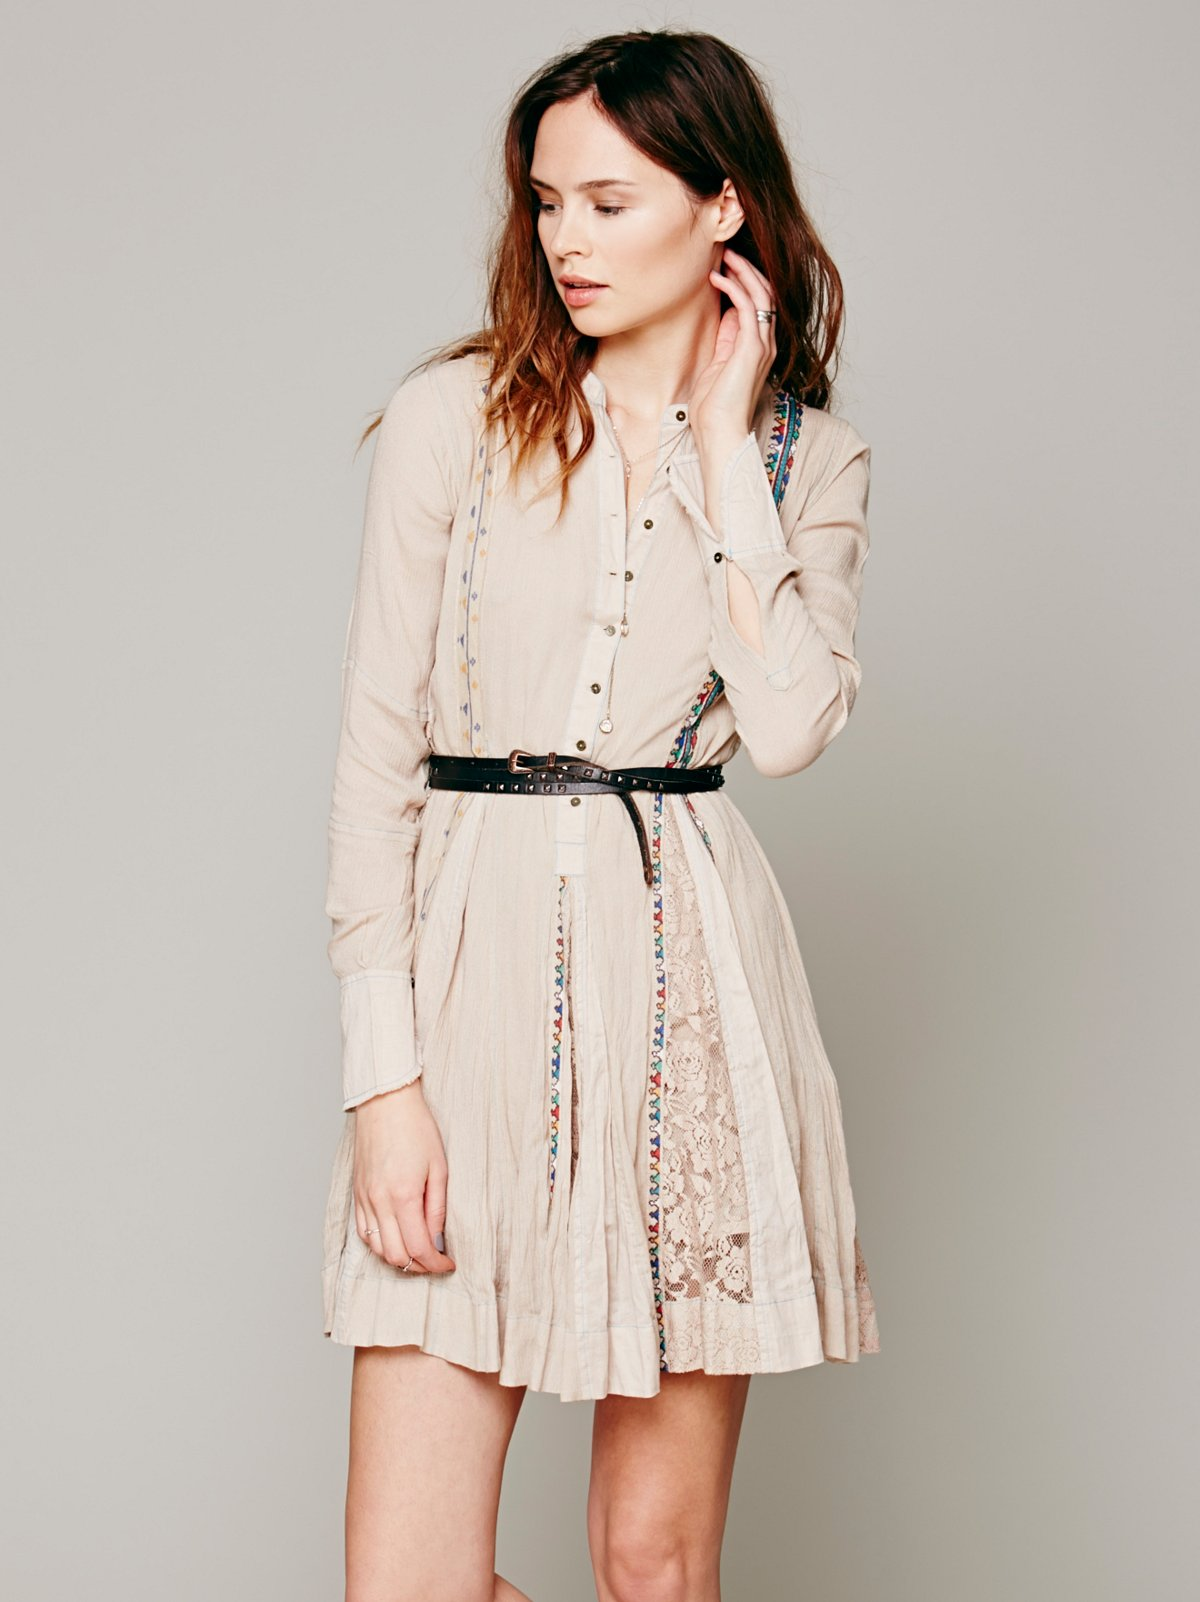 FP ONE Boho Shirt Dress